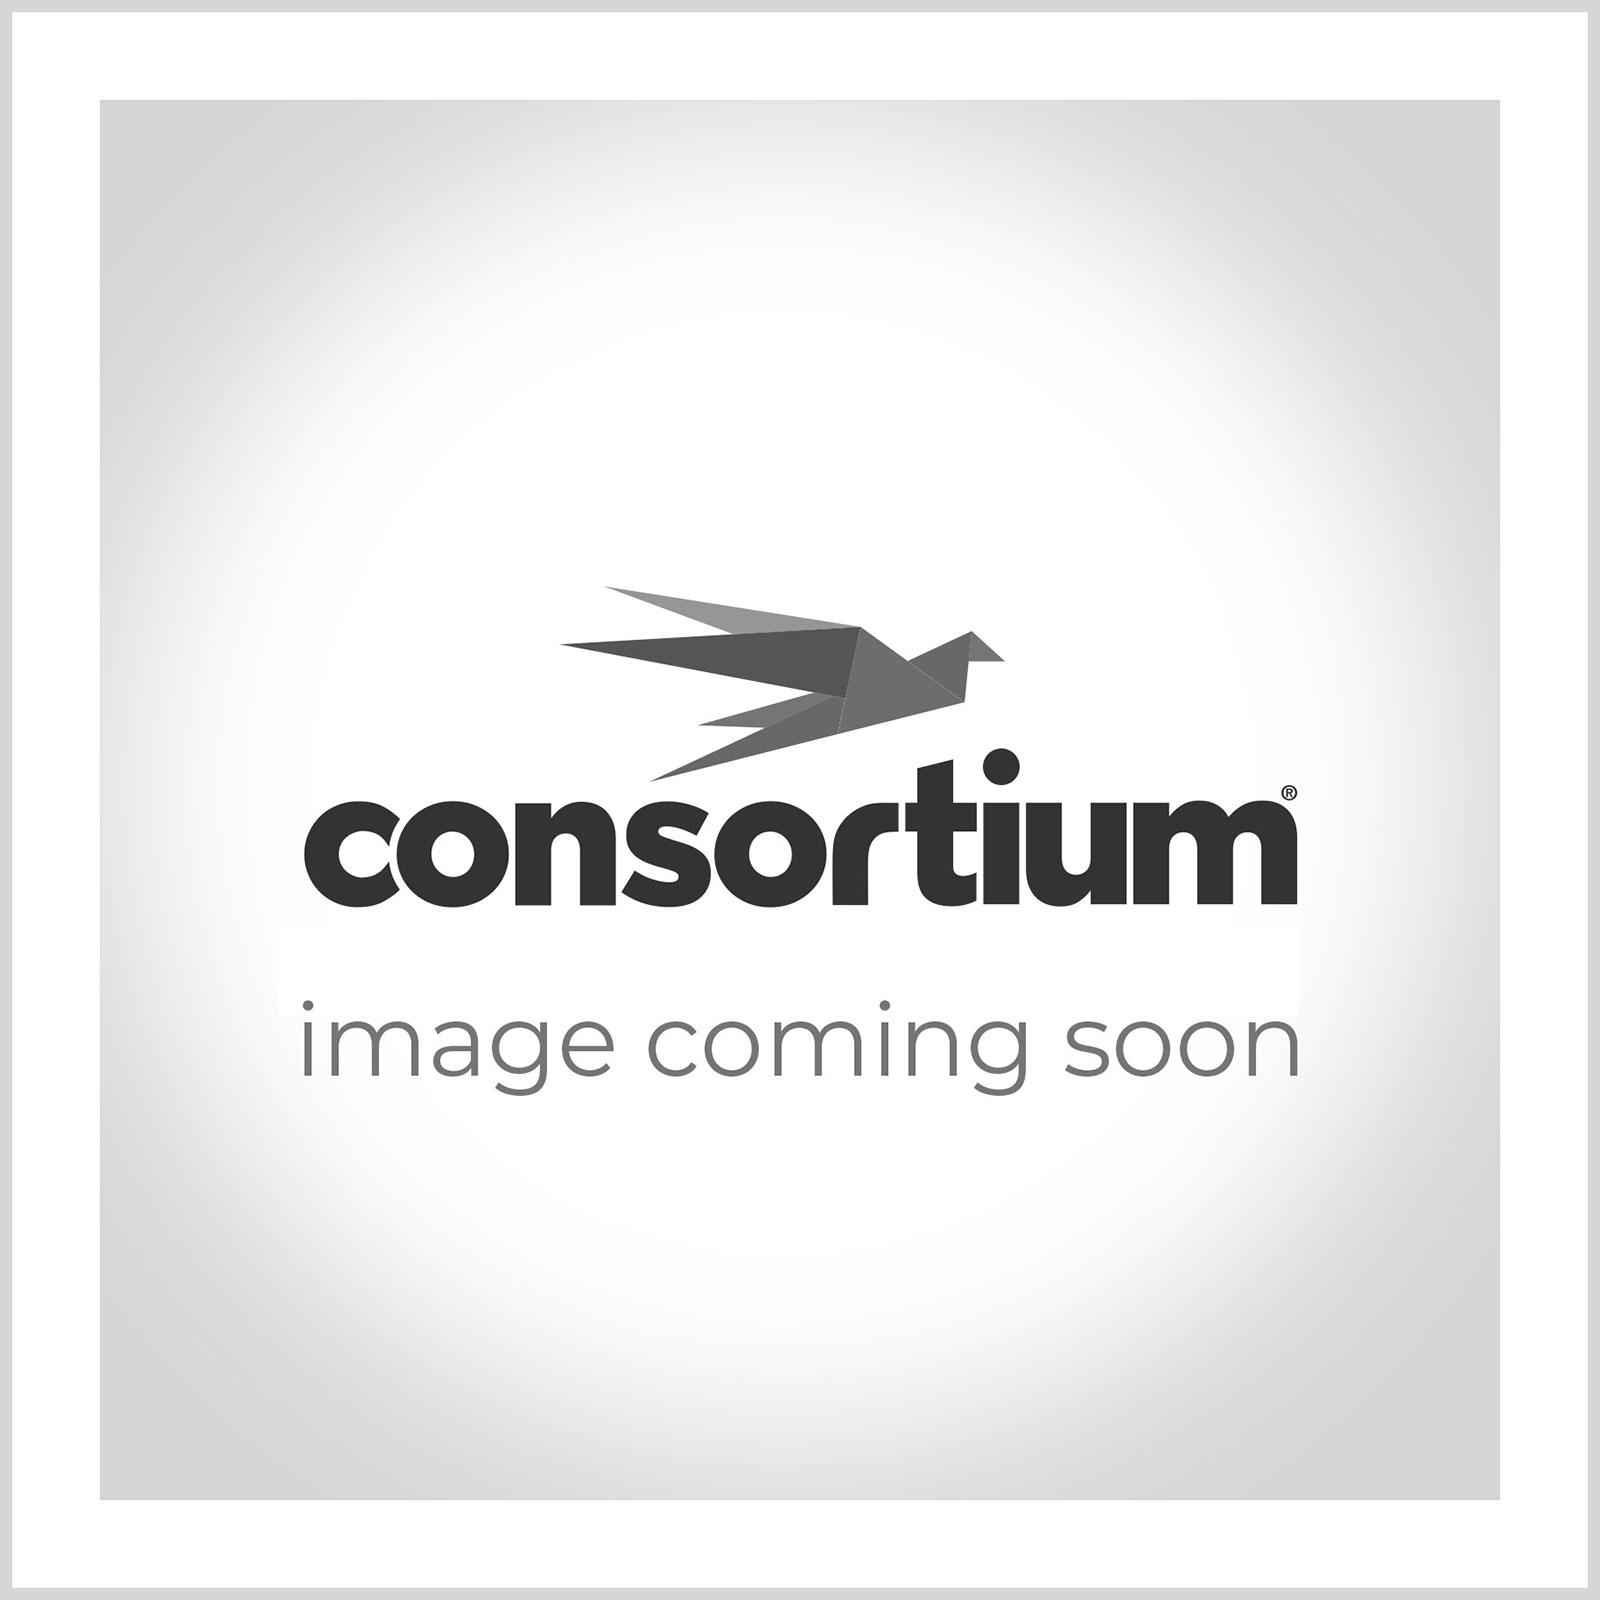 Consortium 750KG Play Sand Bulk Bag